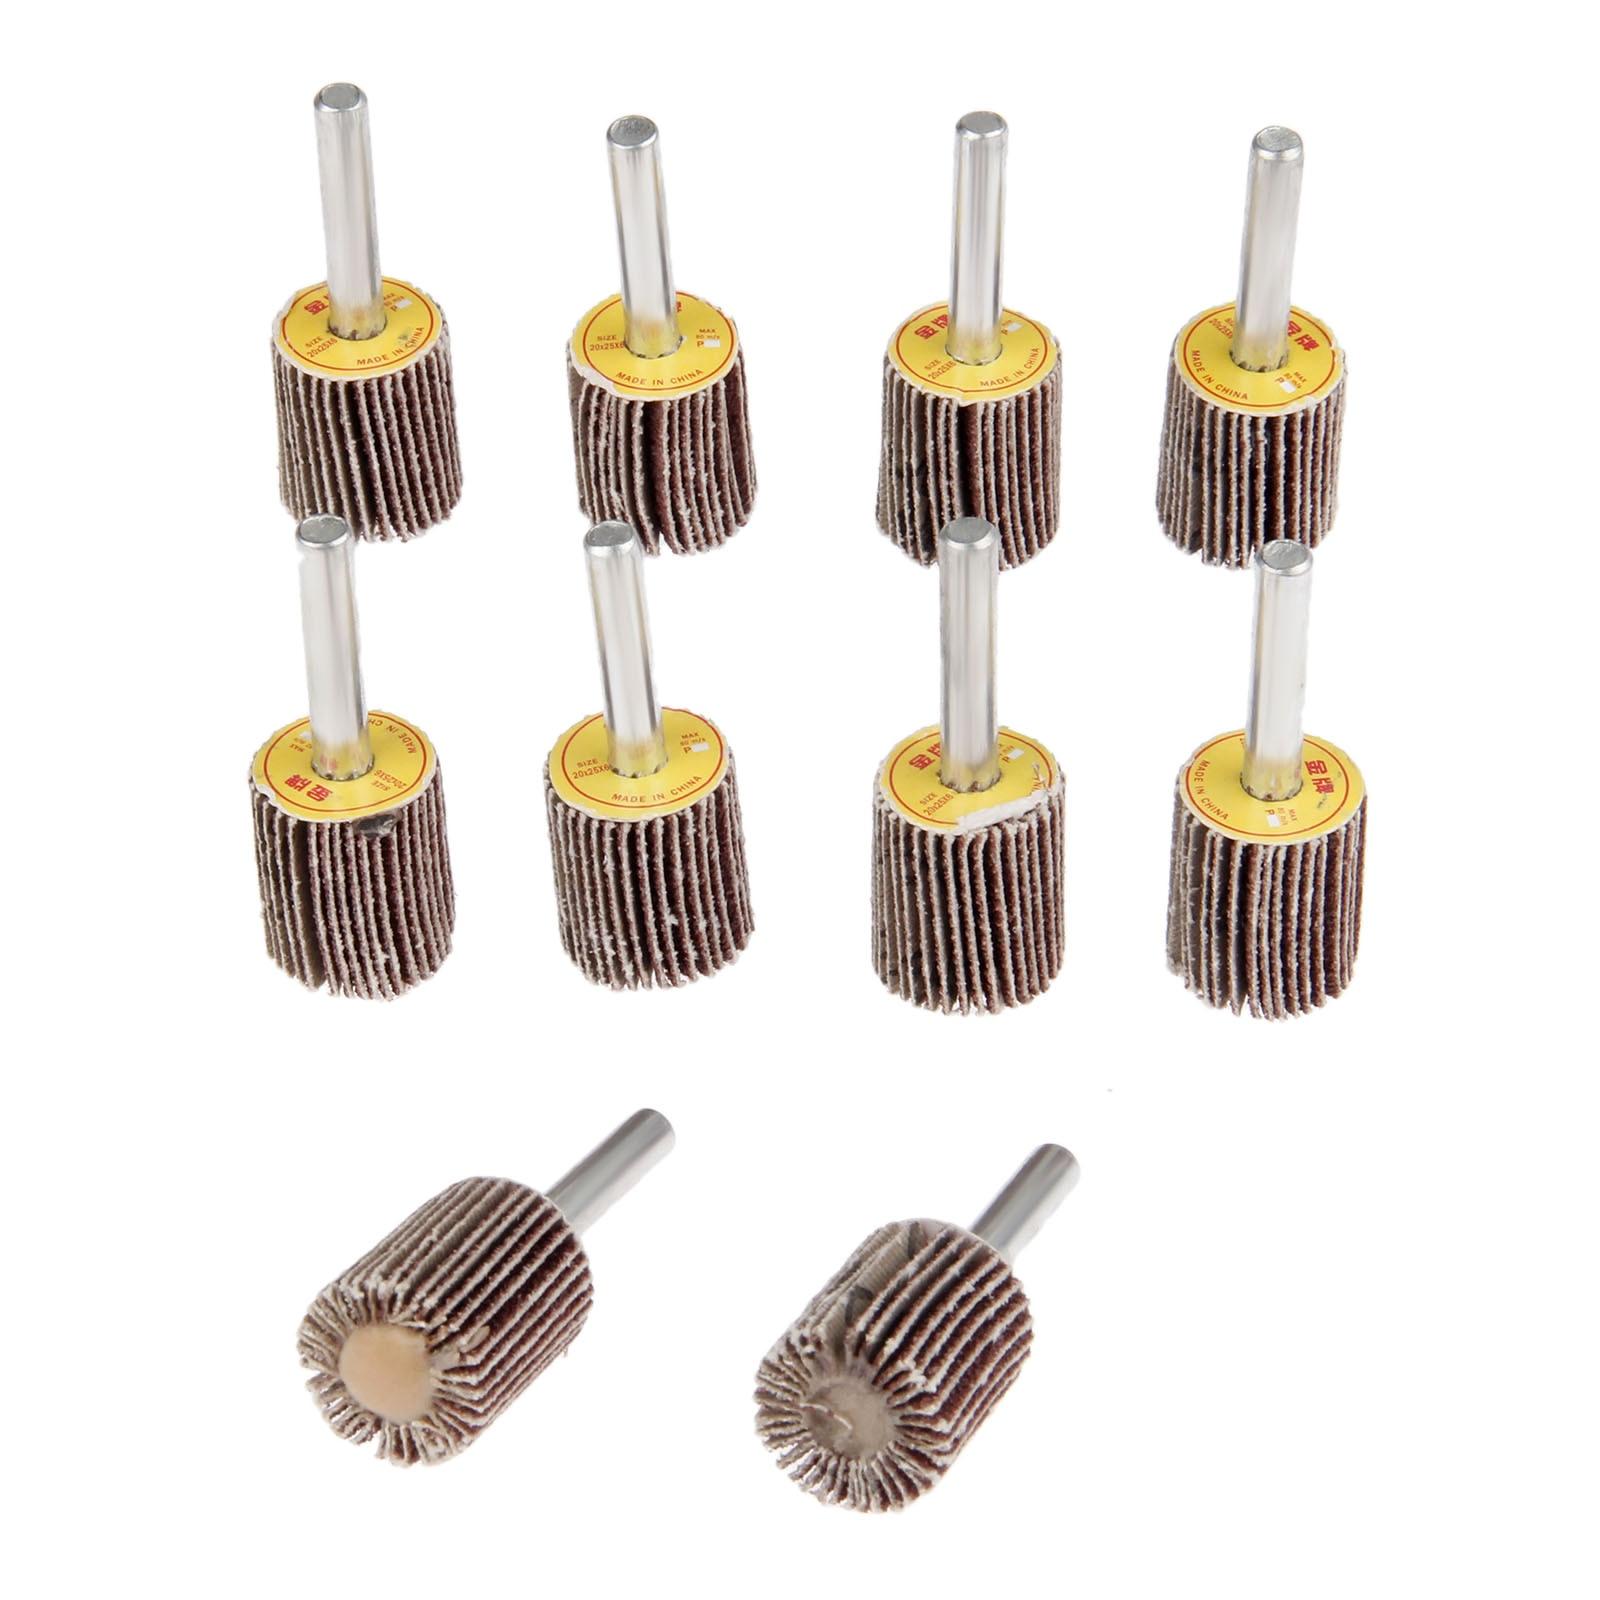 10Pcs Dremel Accessories Grinding Buffing Sandpaper Sanding Flap Wheel Head 20mm+Mandrel 6mm For Mini Drill Rotary Tools 80-Grit